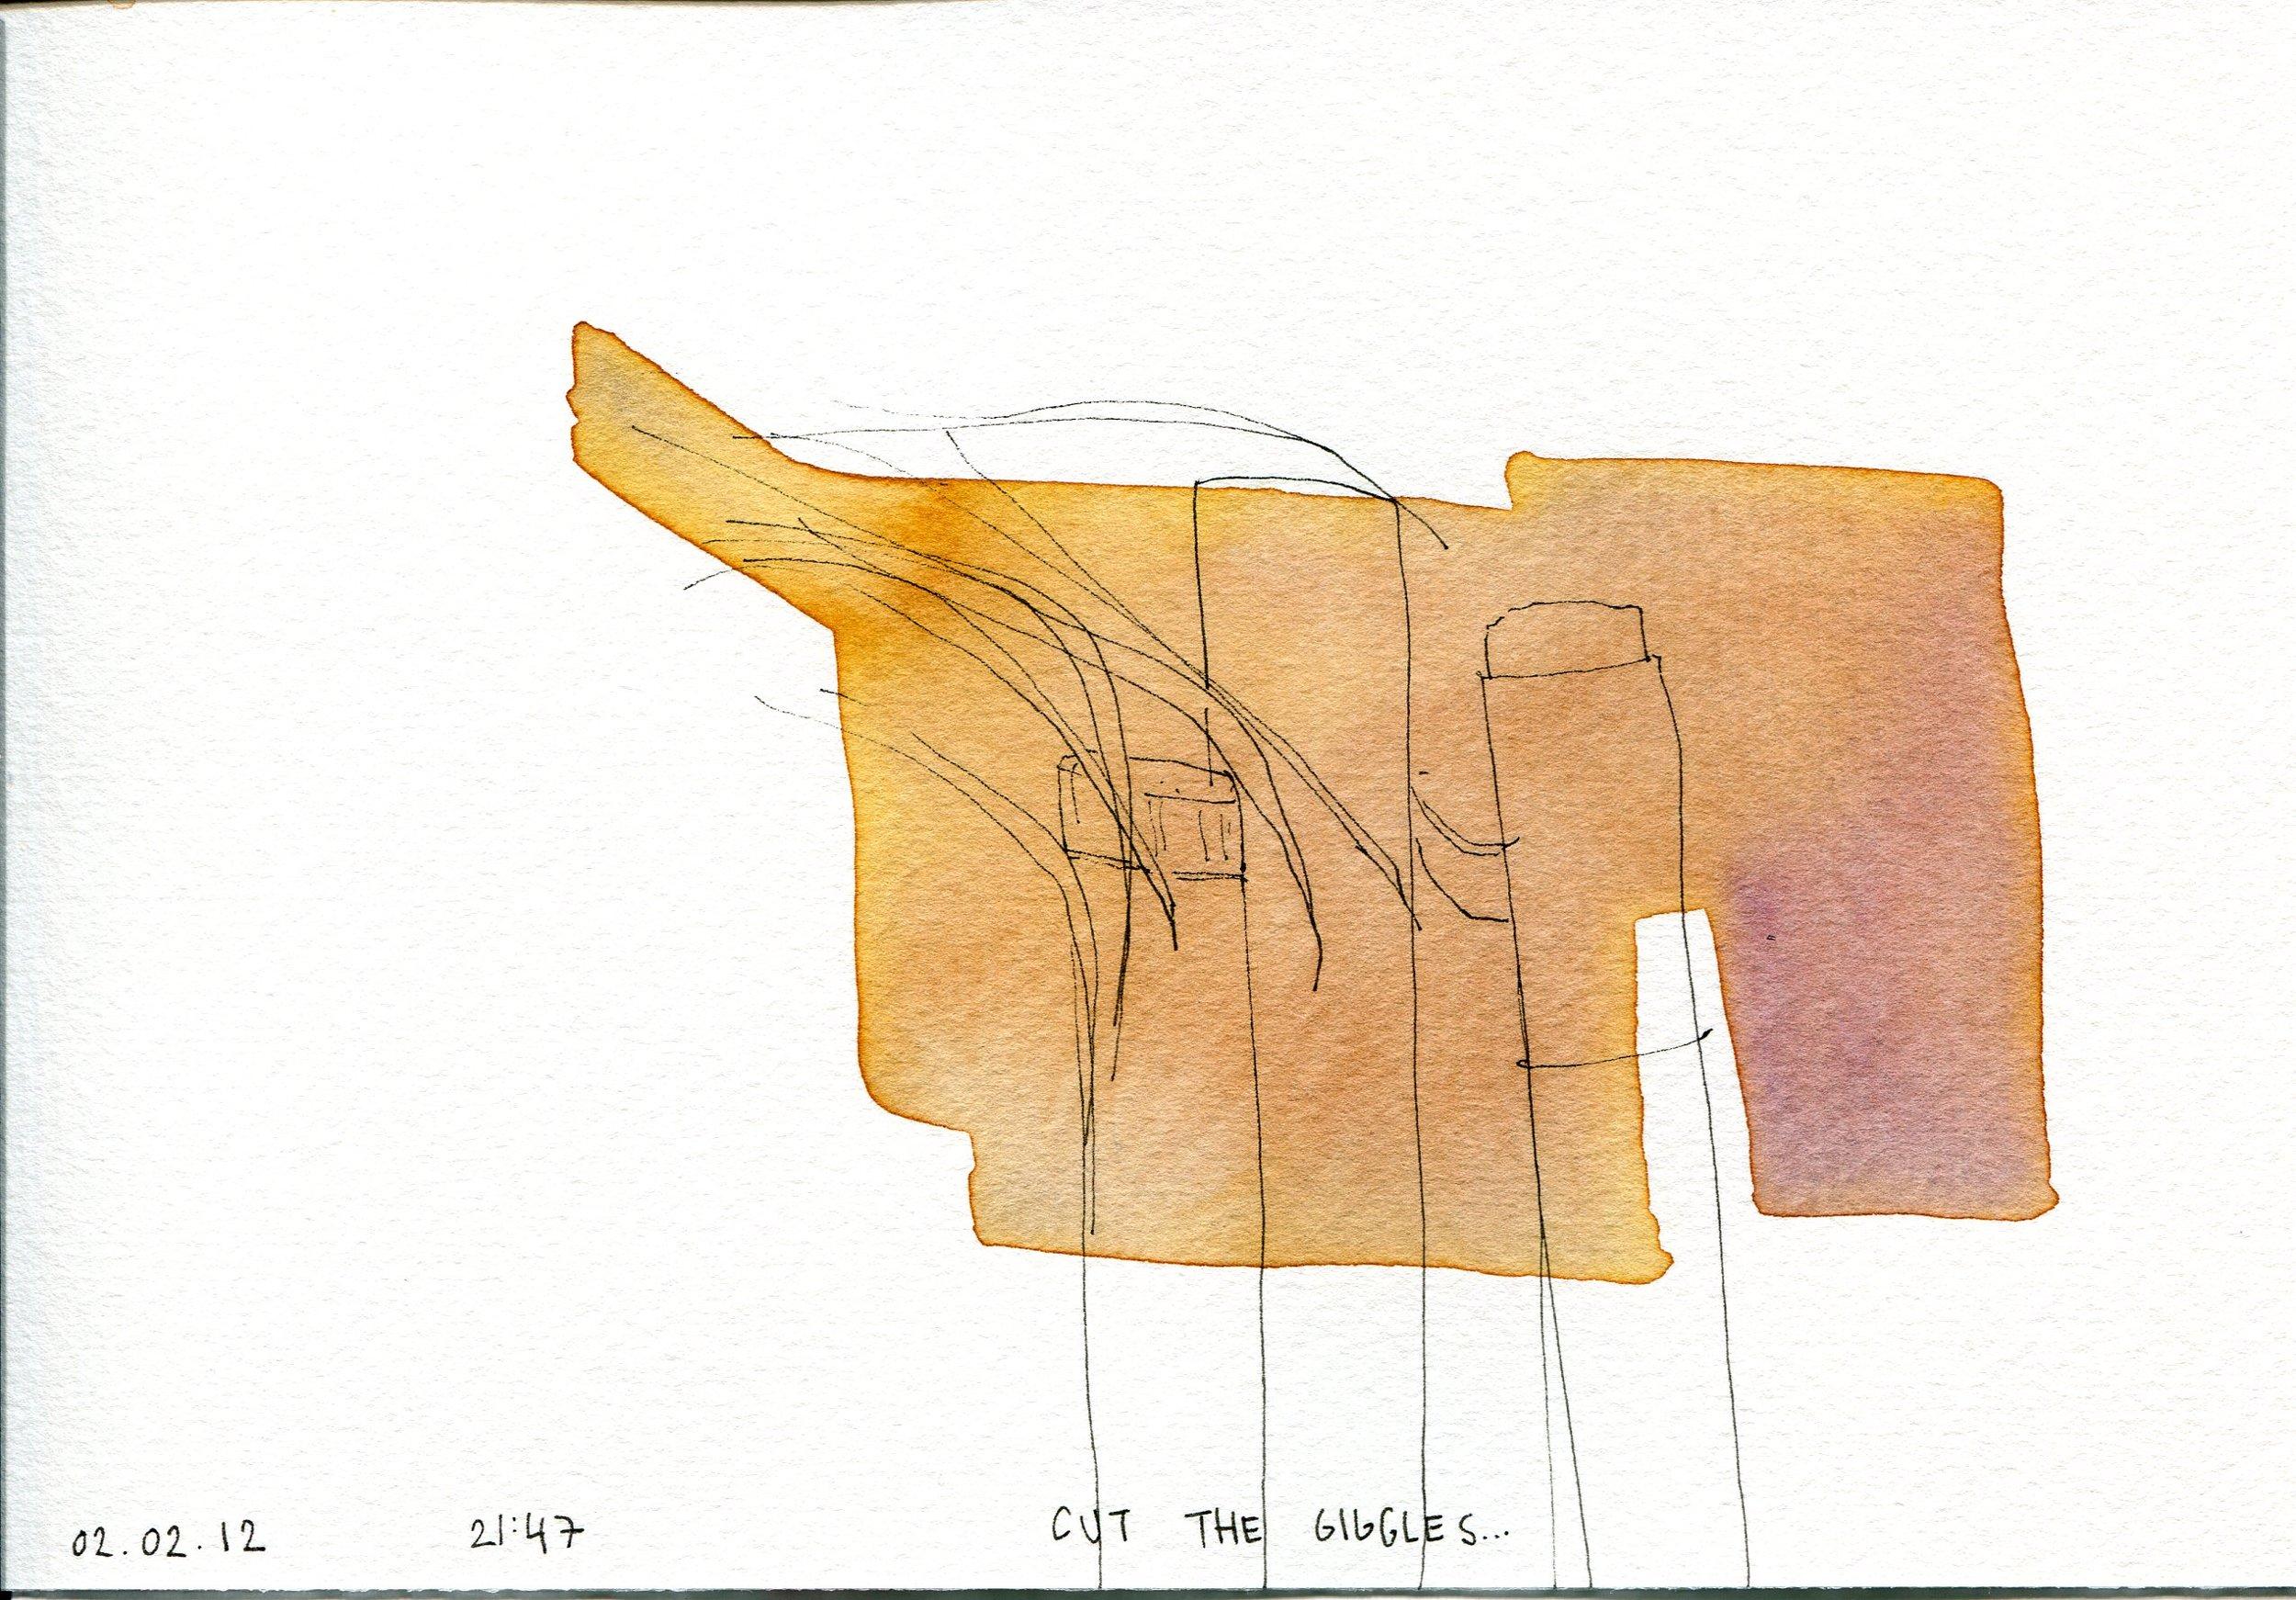 2012-02-04 drawing005.jpg